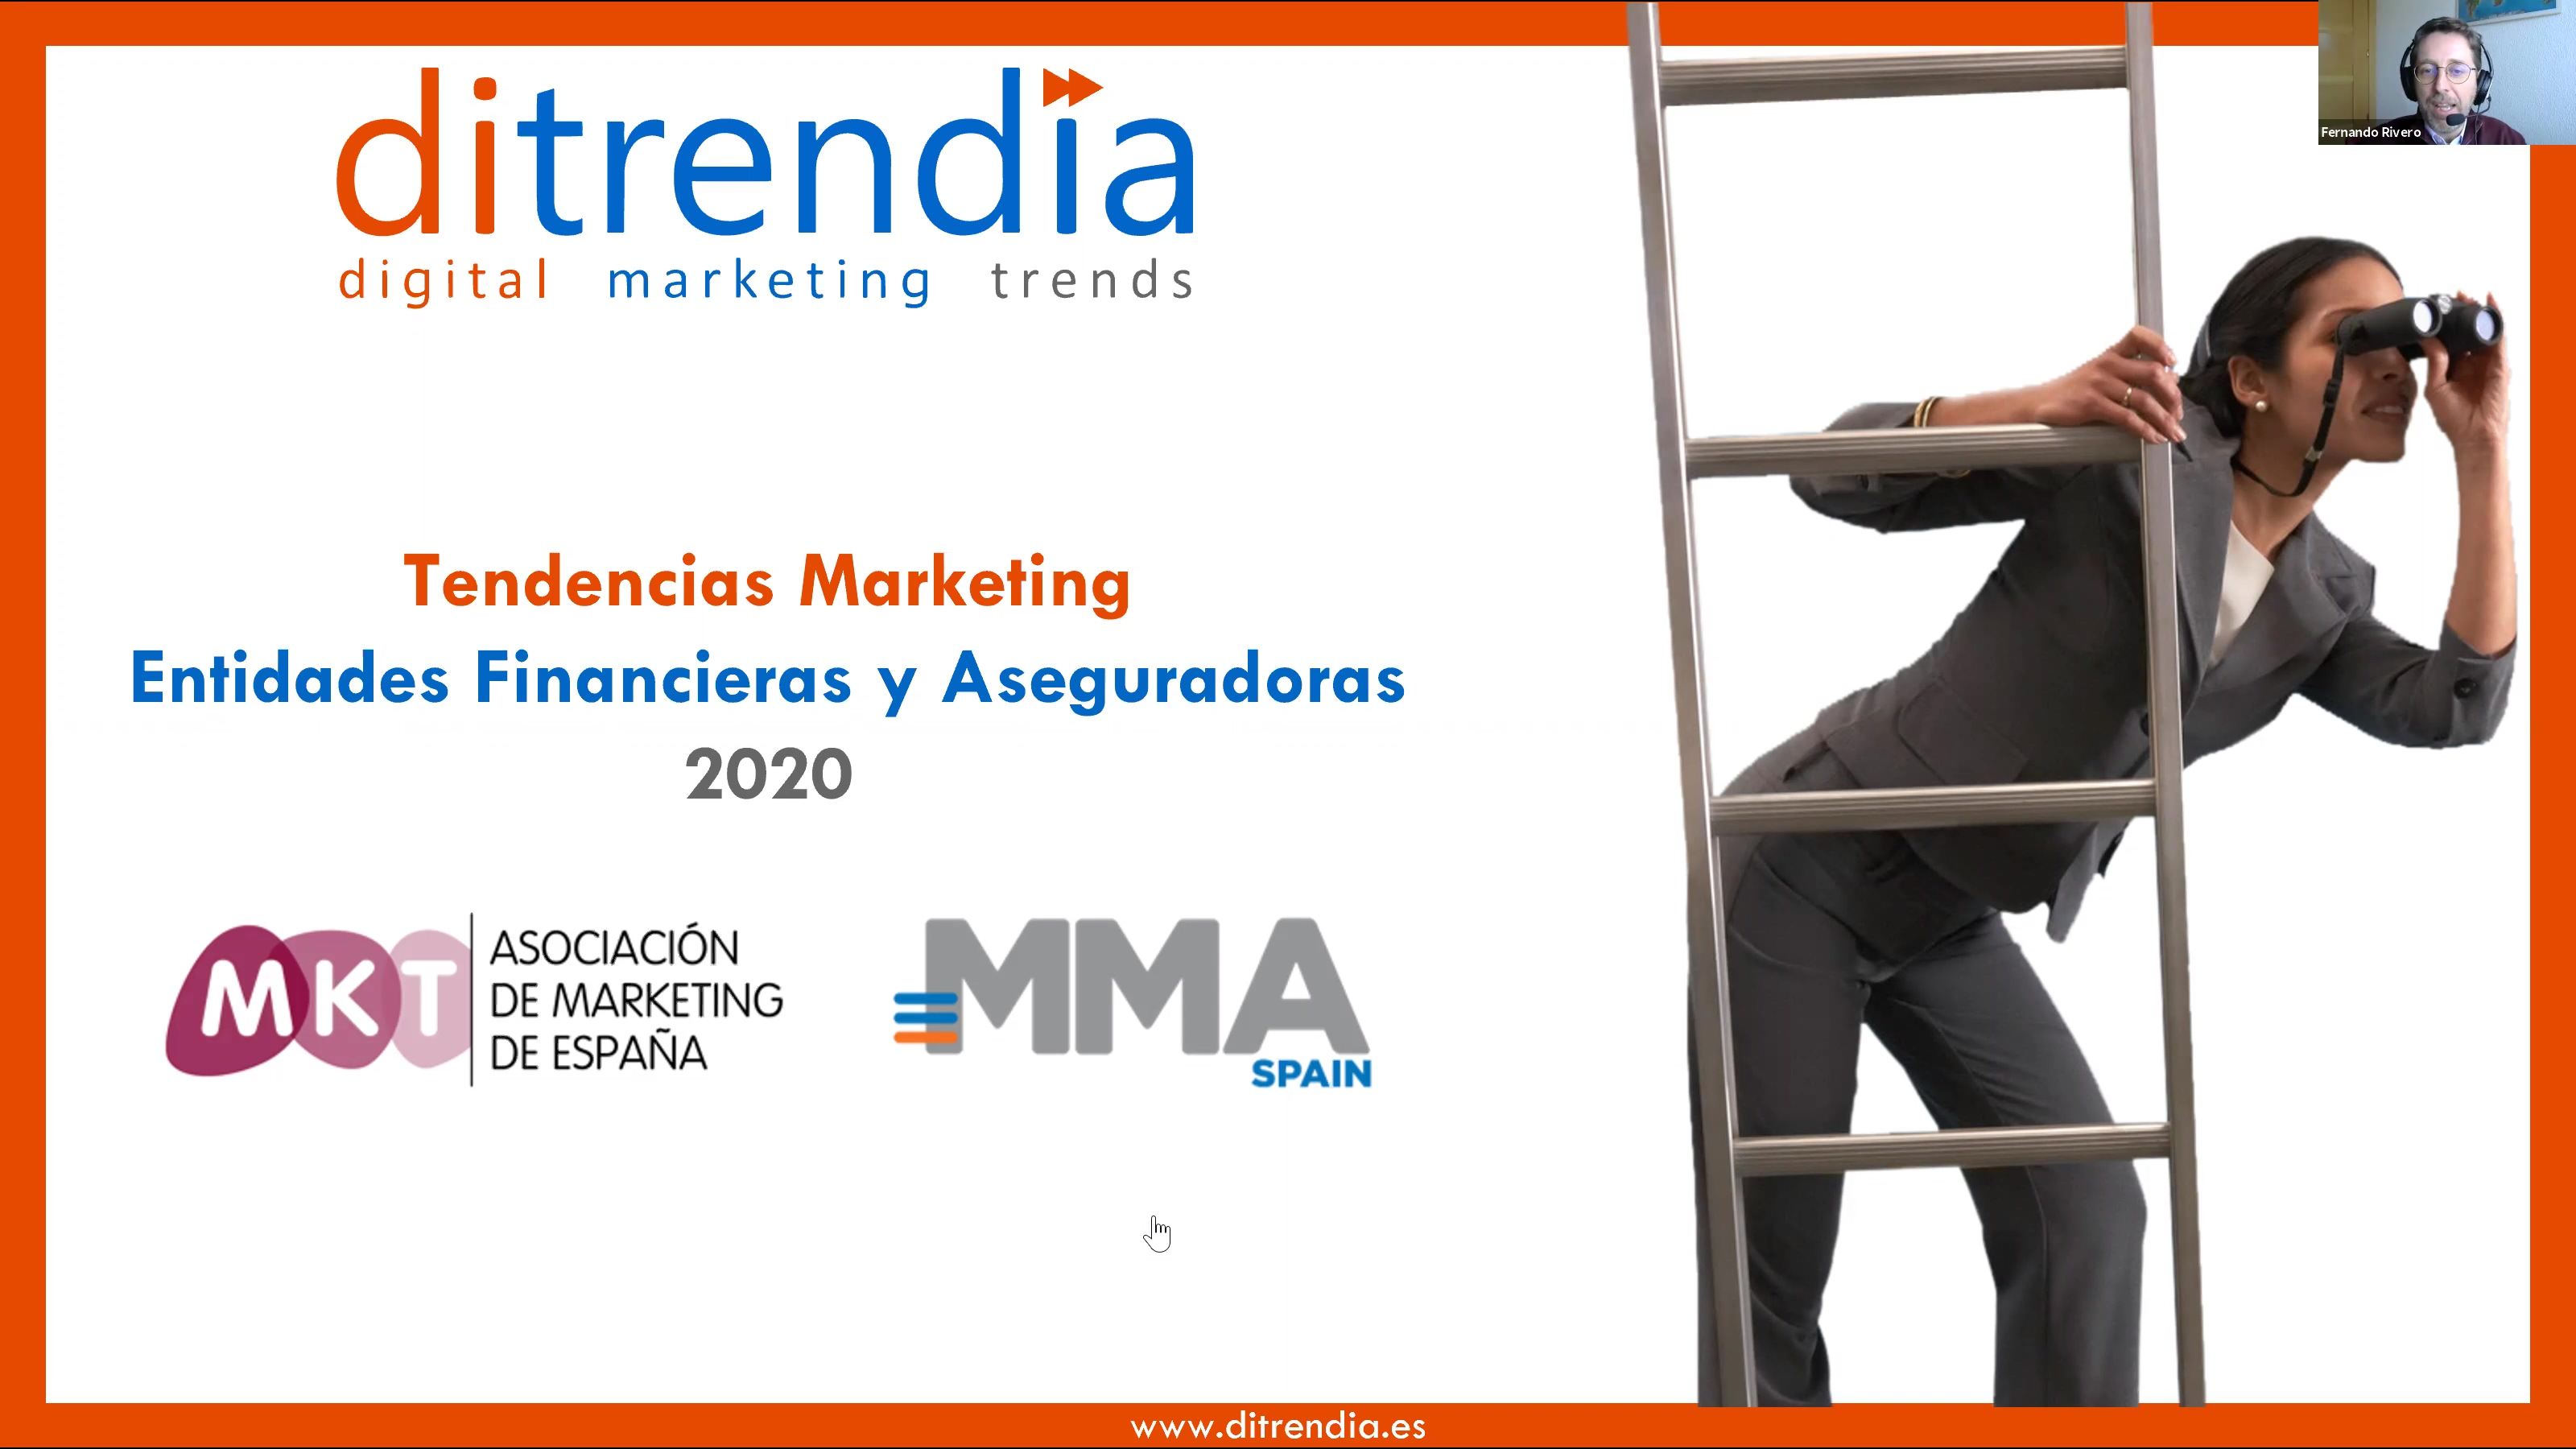 Webinar-Tendencias-Marketing-Ditrendia